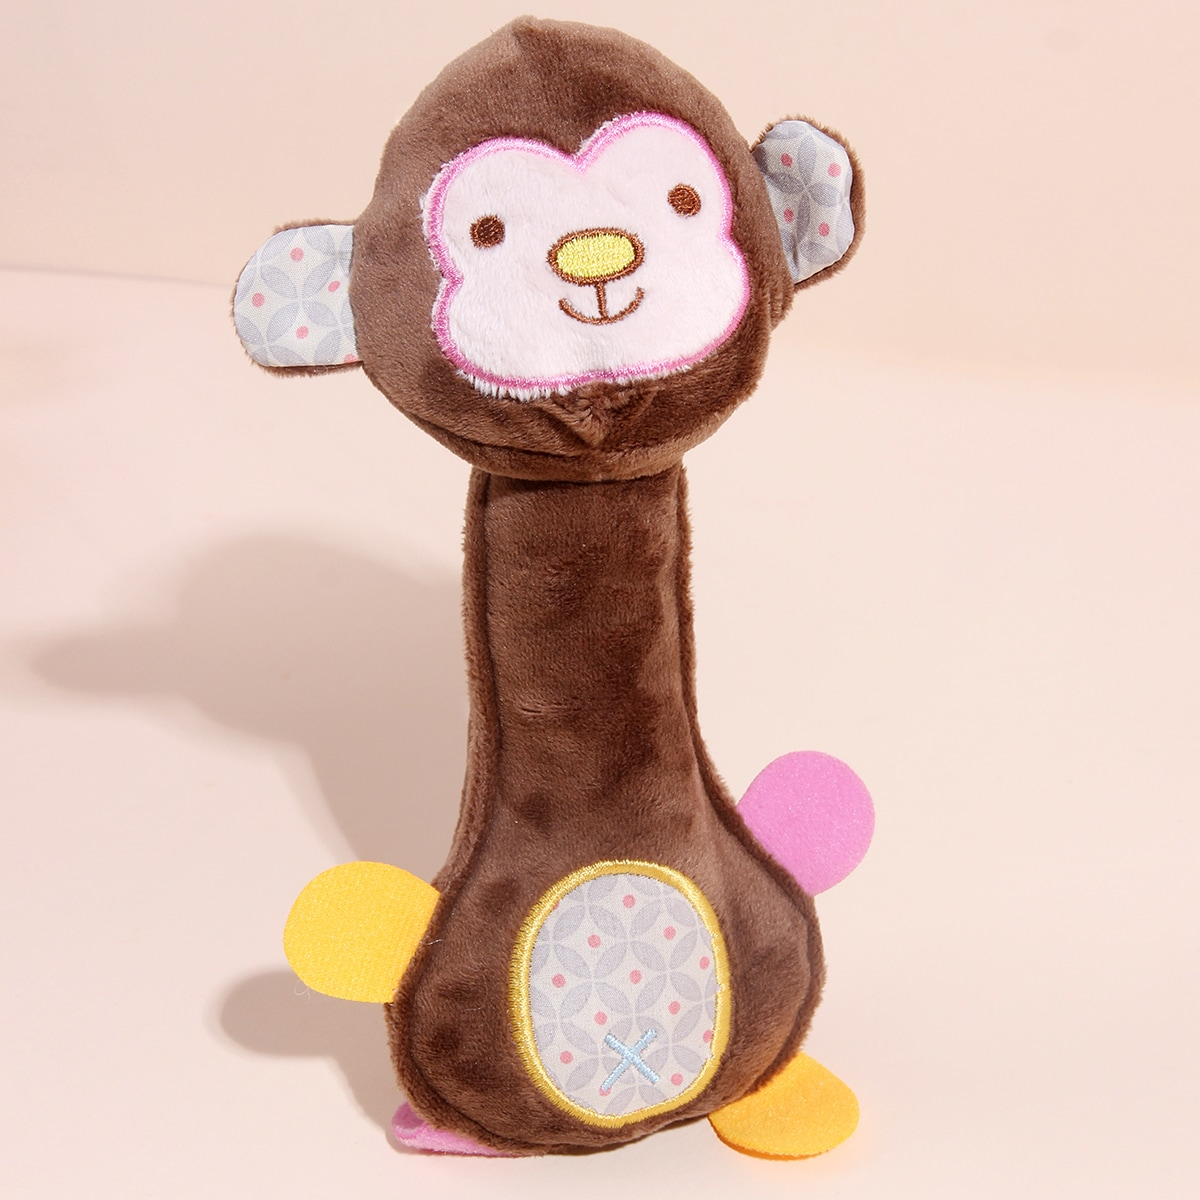 Hund Soundspielzeug mit Affe Design